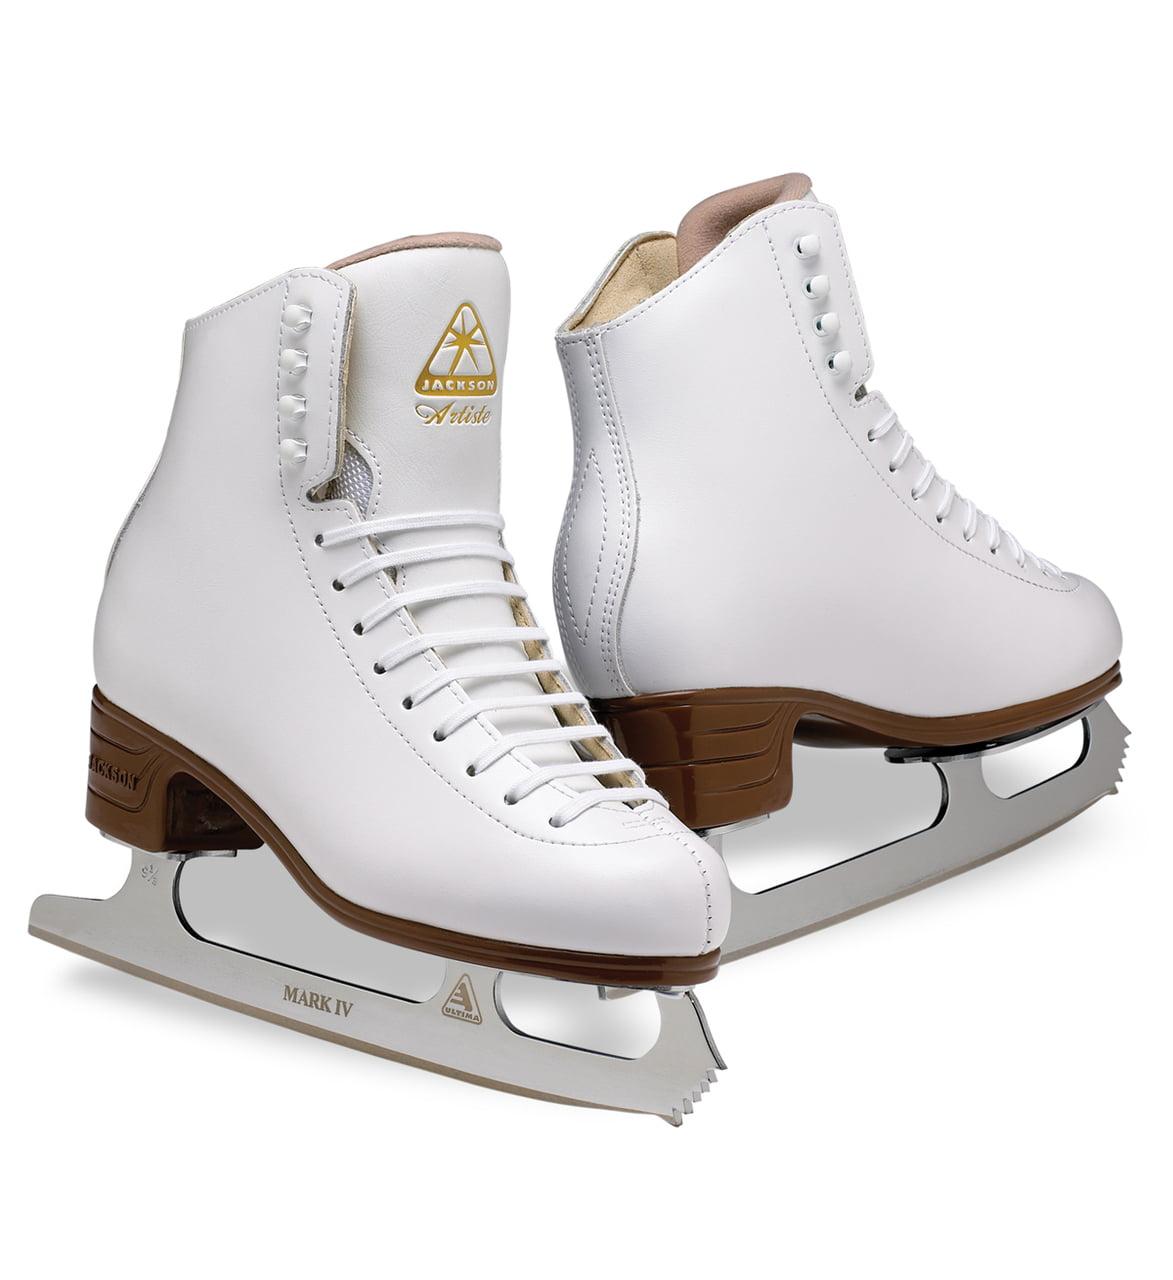 Figure Skates Artiste Ladies JS1790 by